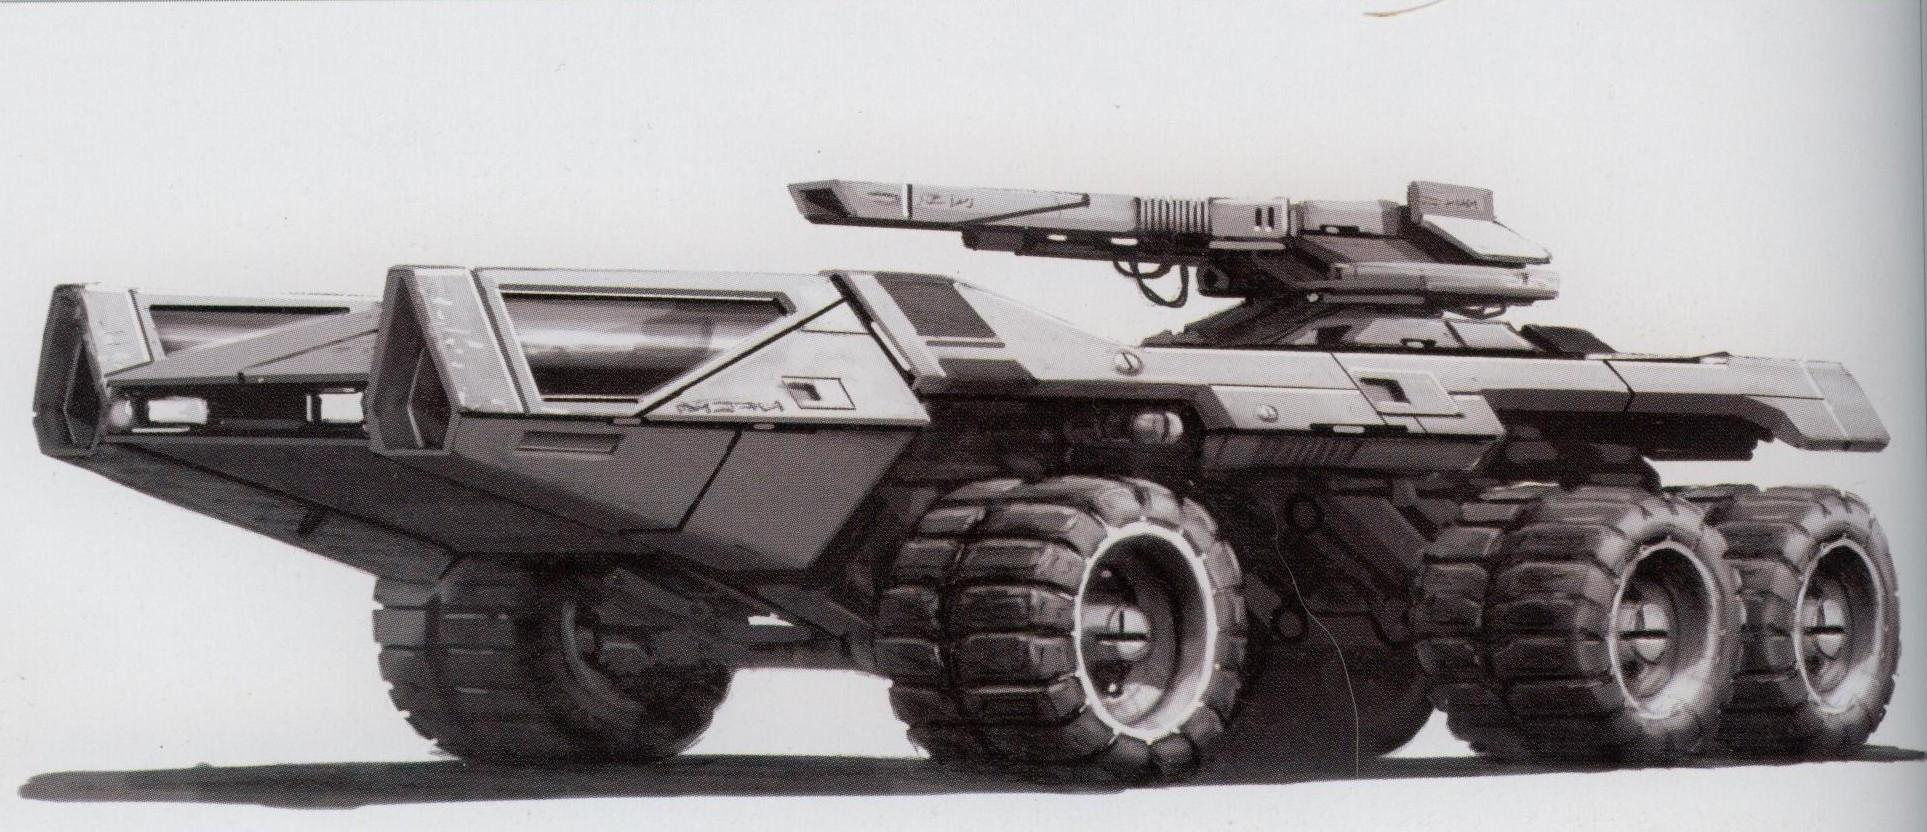 Anti Vehicle Platform-I Liberator